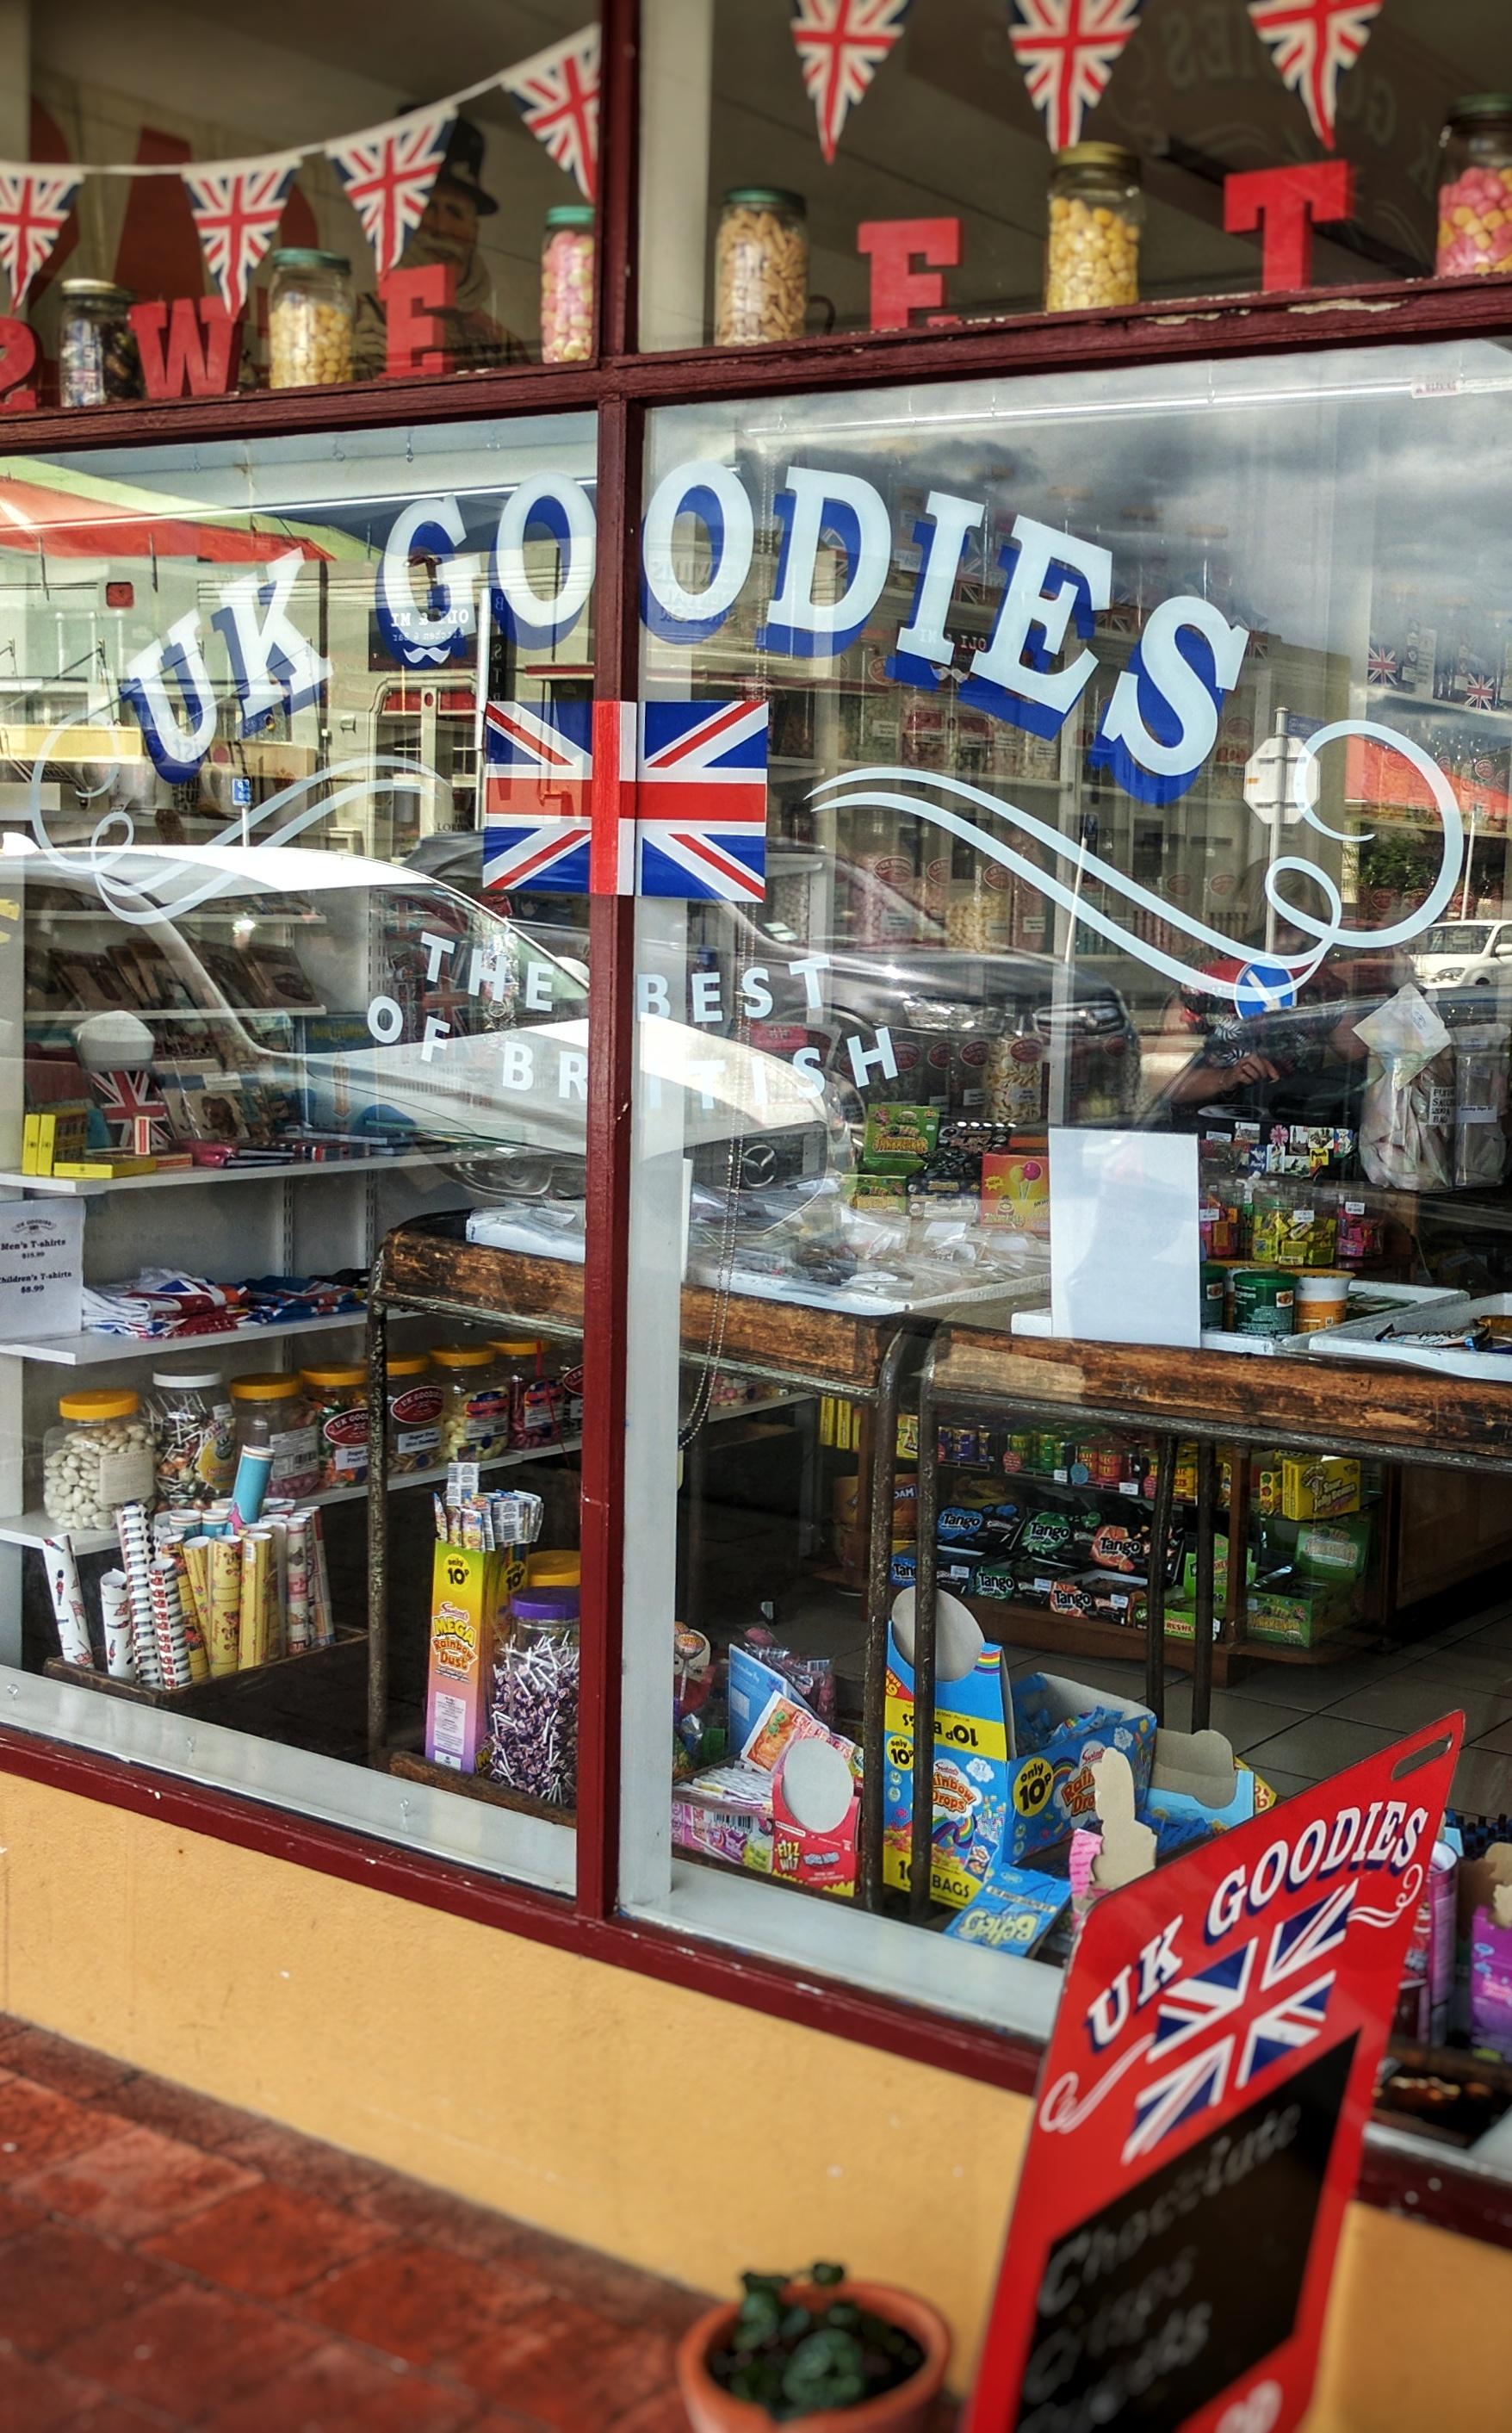 UK Goodies shop front (Petone, NZ)